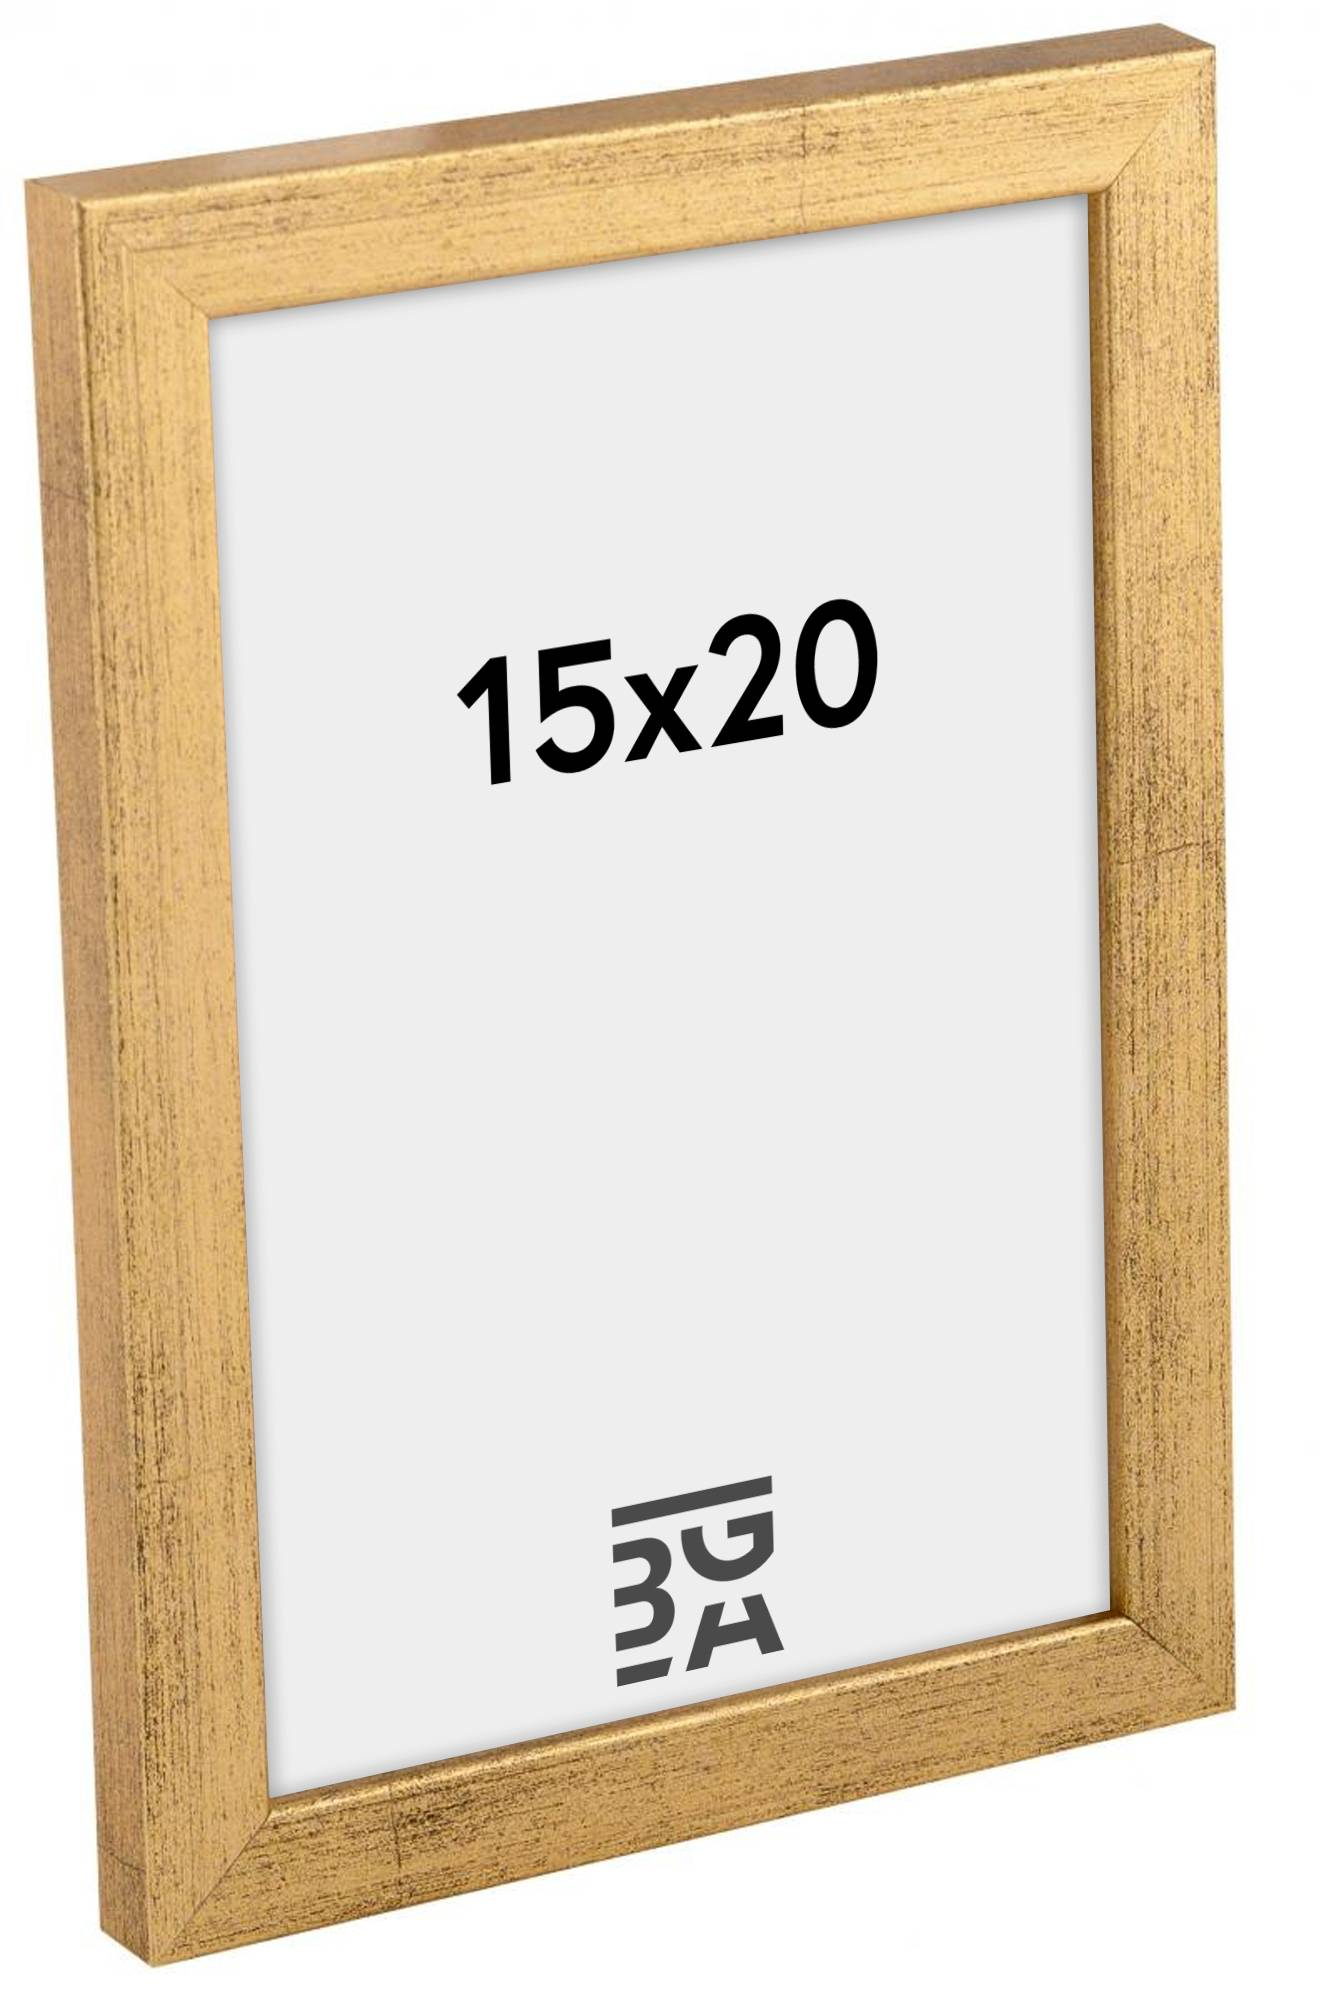 Estancia Galant Kullanvärinen 15x20 cm